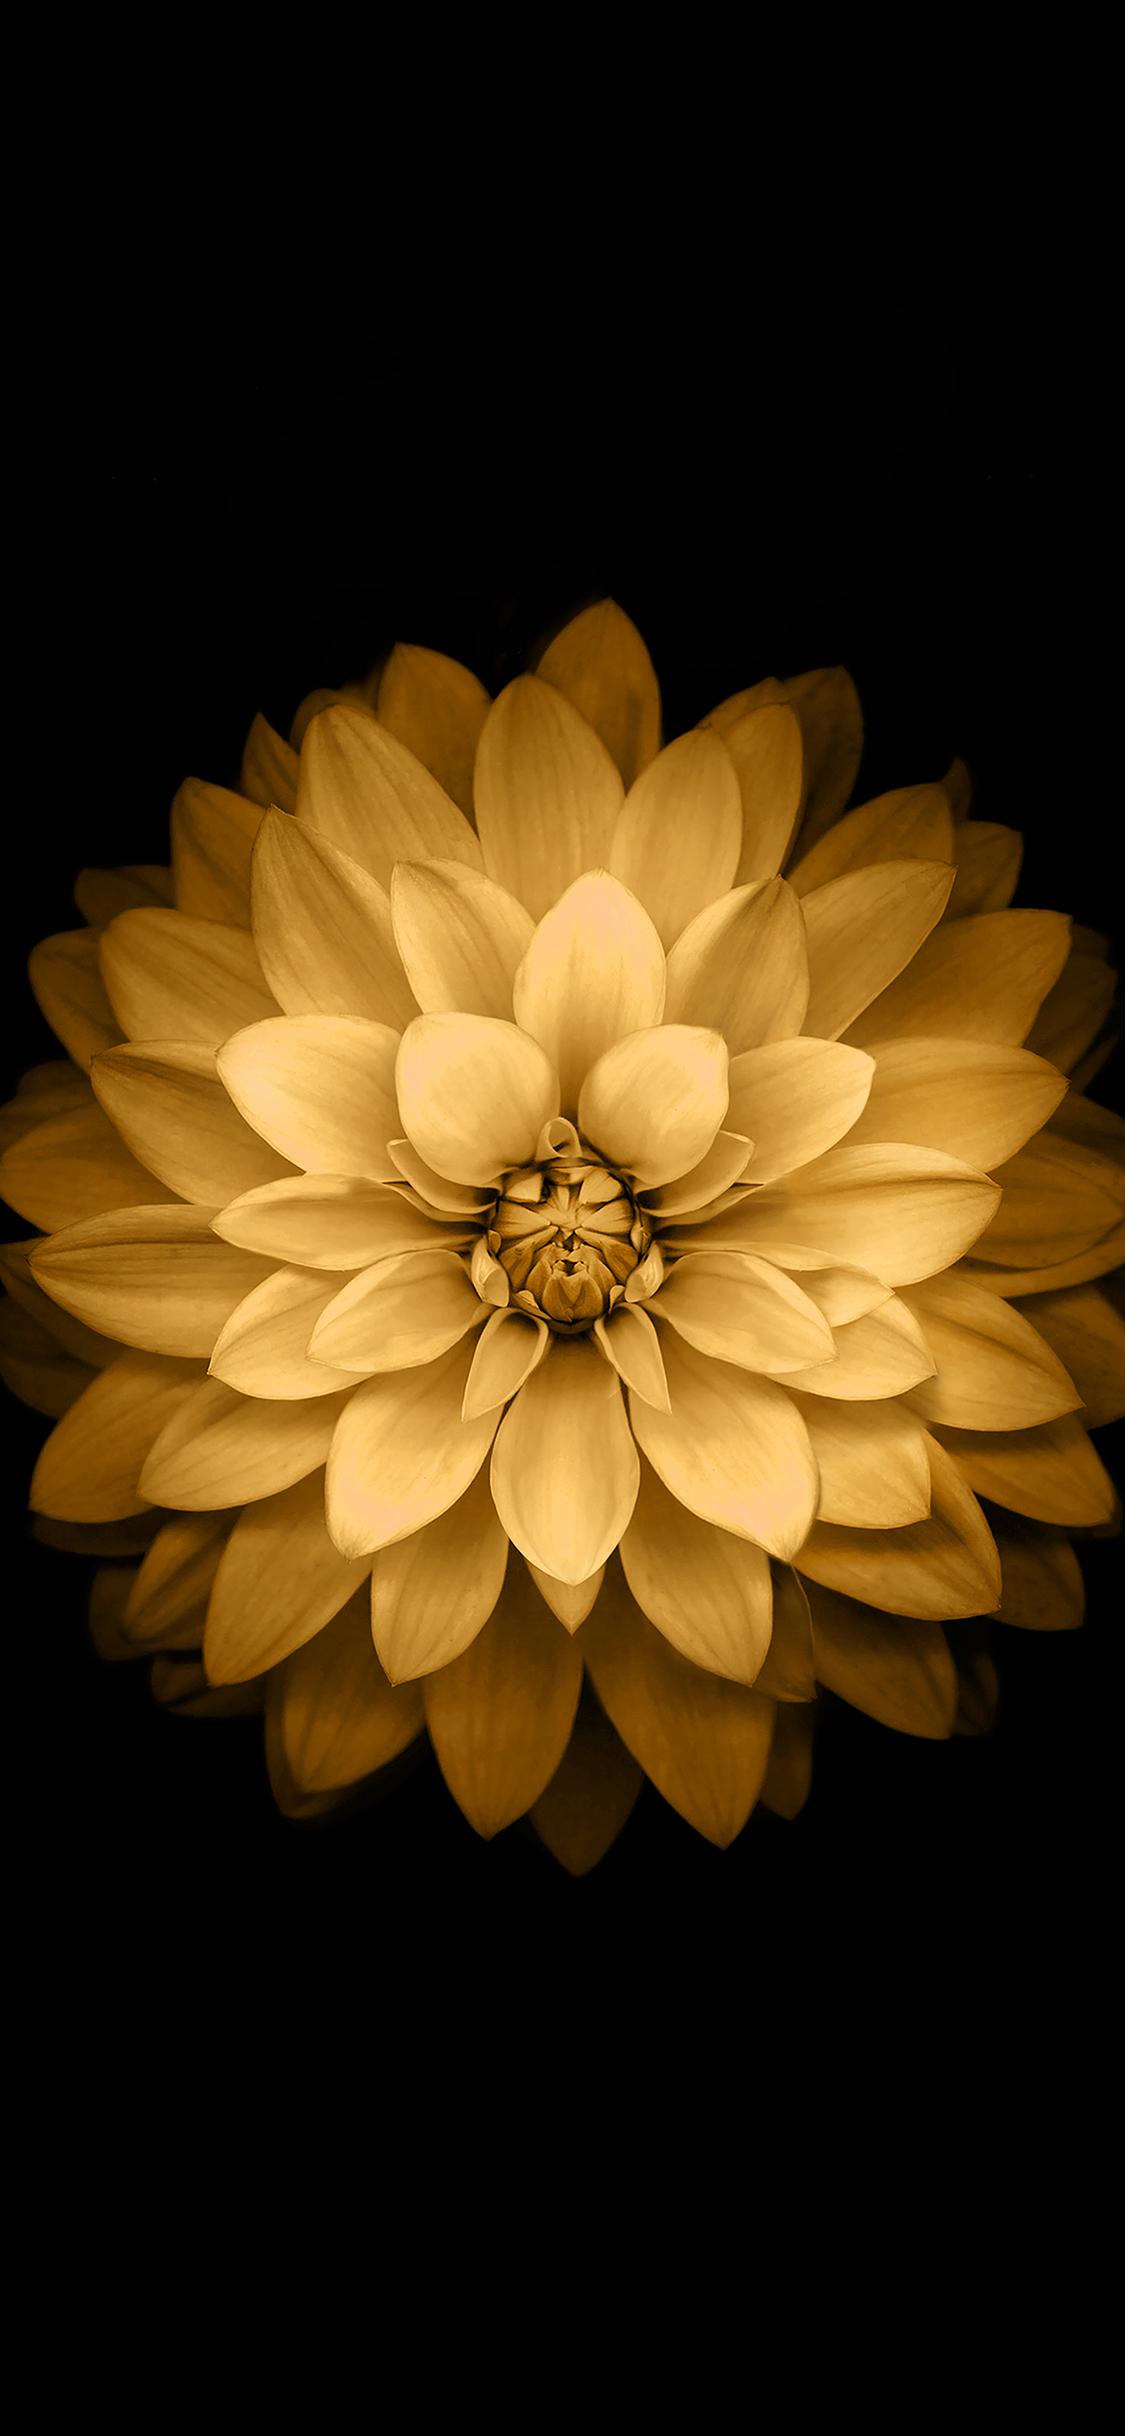 iPhoneXpapers.com-Apple-iPhone-wallpaper-ad39-apple-yellow-lotus-iphone6-plus-ios8-flower